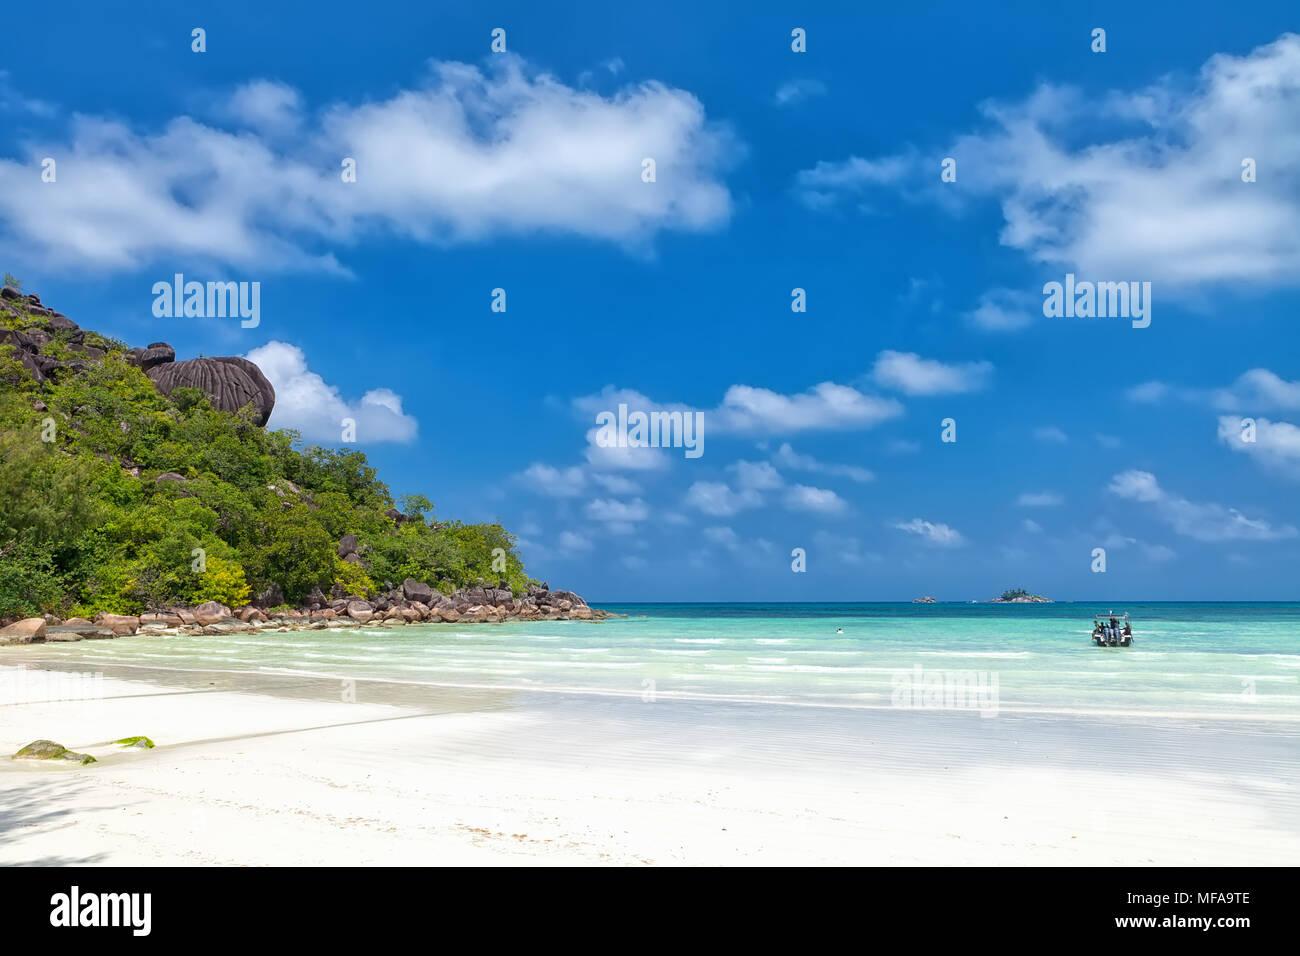 White coral sand on а tropical beach. Praslin island, Seychelles - Stock Image